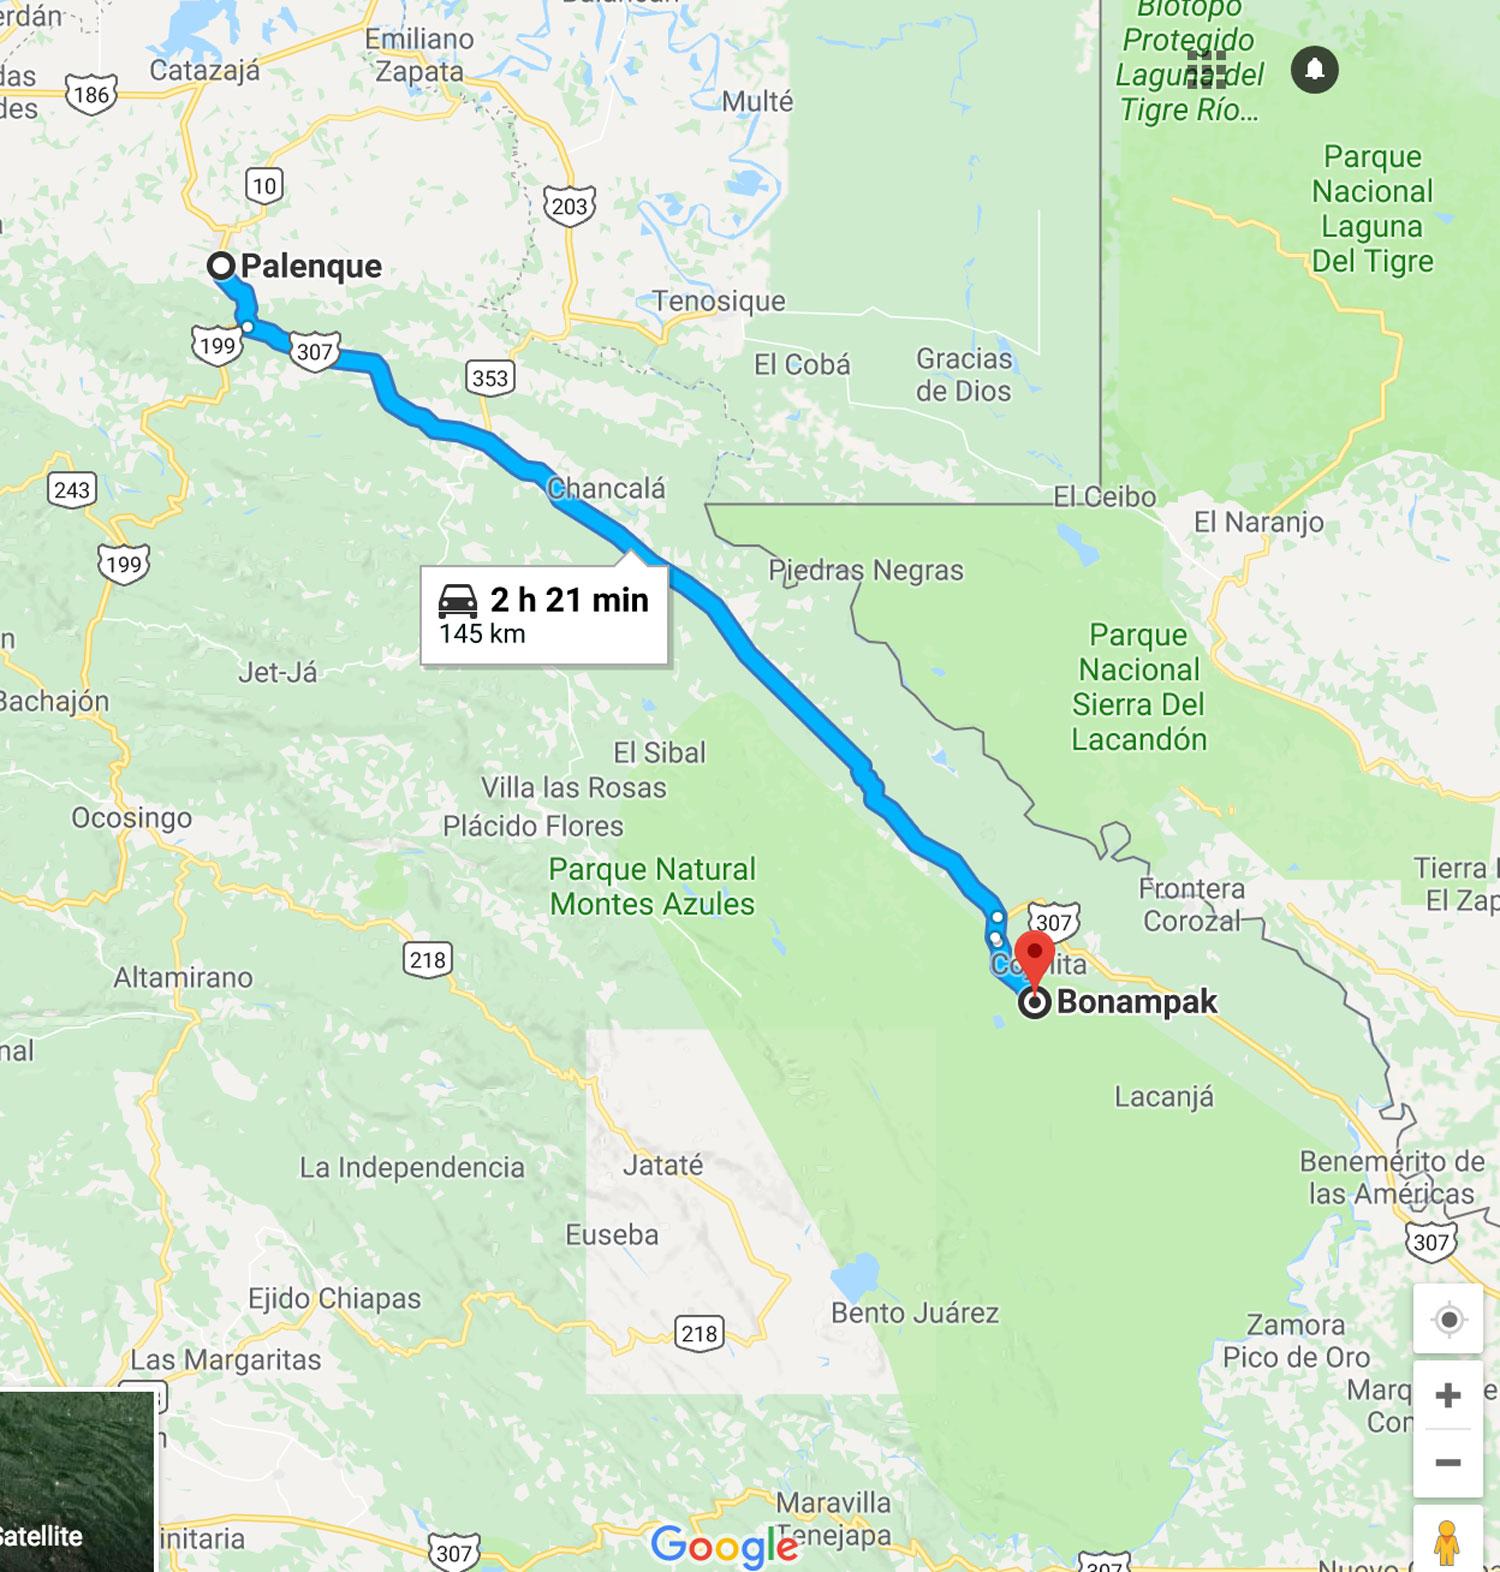 Hammocks_and_Ruins_Blog_Riviera_Maya_Mexico_Travel_Discover_Explore_What_to_do_Jungles_Lacanja_2.jpg